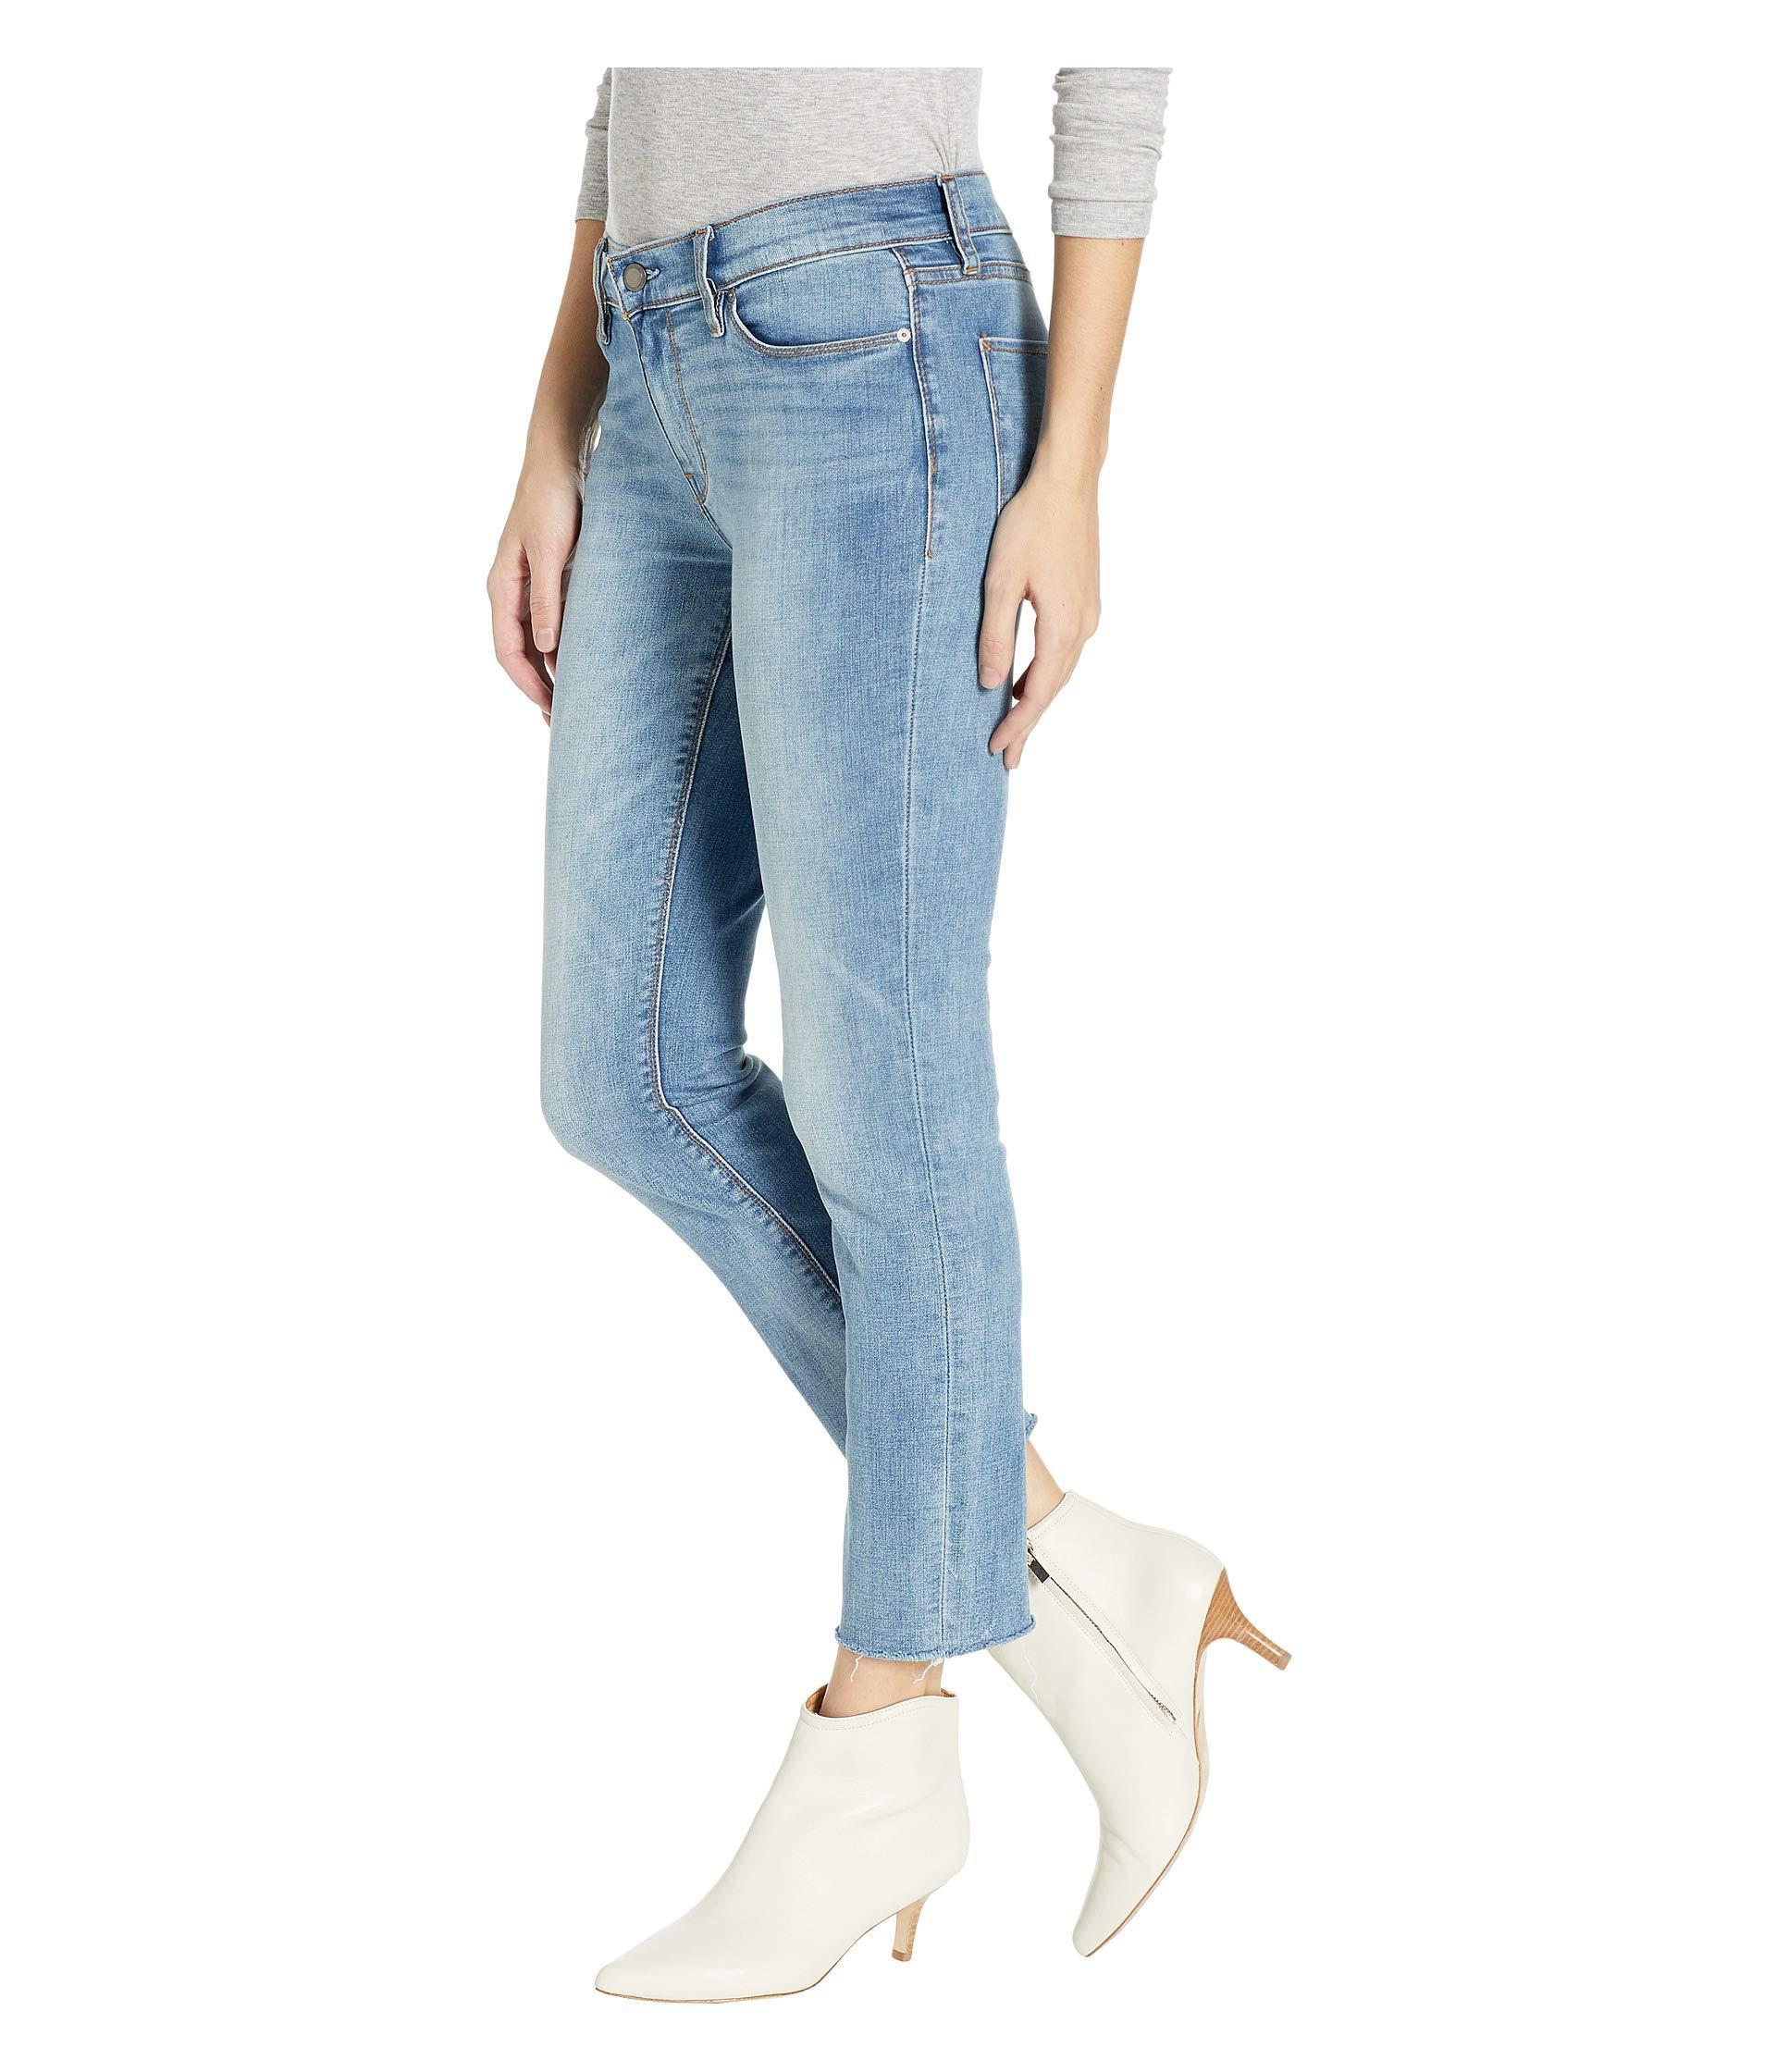 5bed1f5ddbd Lyst - Hudson Jeans Tally Mid-rise Skinny Crop In Radical (raw Hem)  (radical (raw Hem)) Women's Jeans in Blue